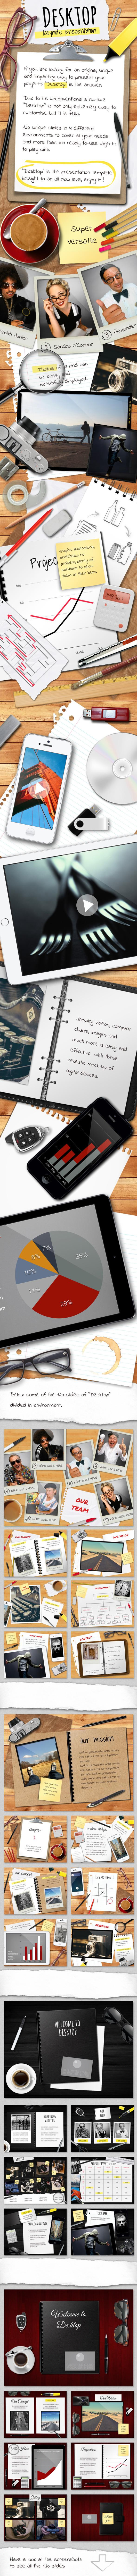 Desktop Keynote presentation - Keynote Templates Presentation Templates